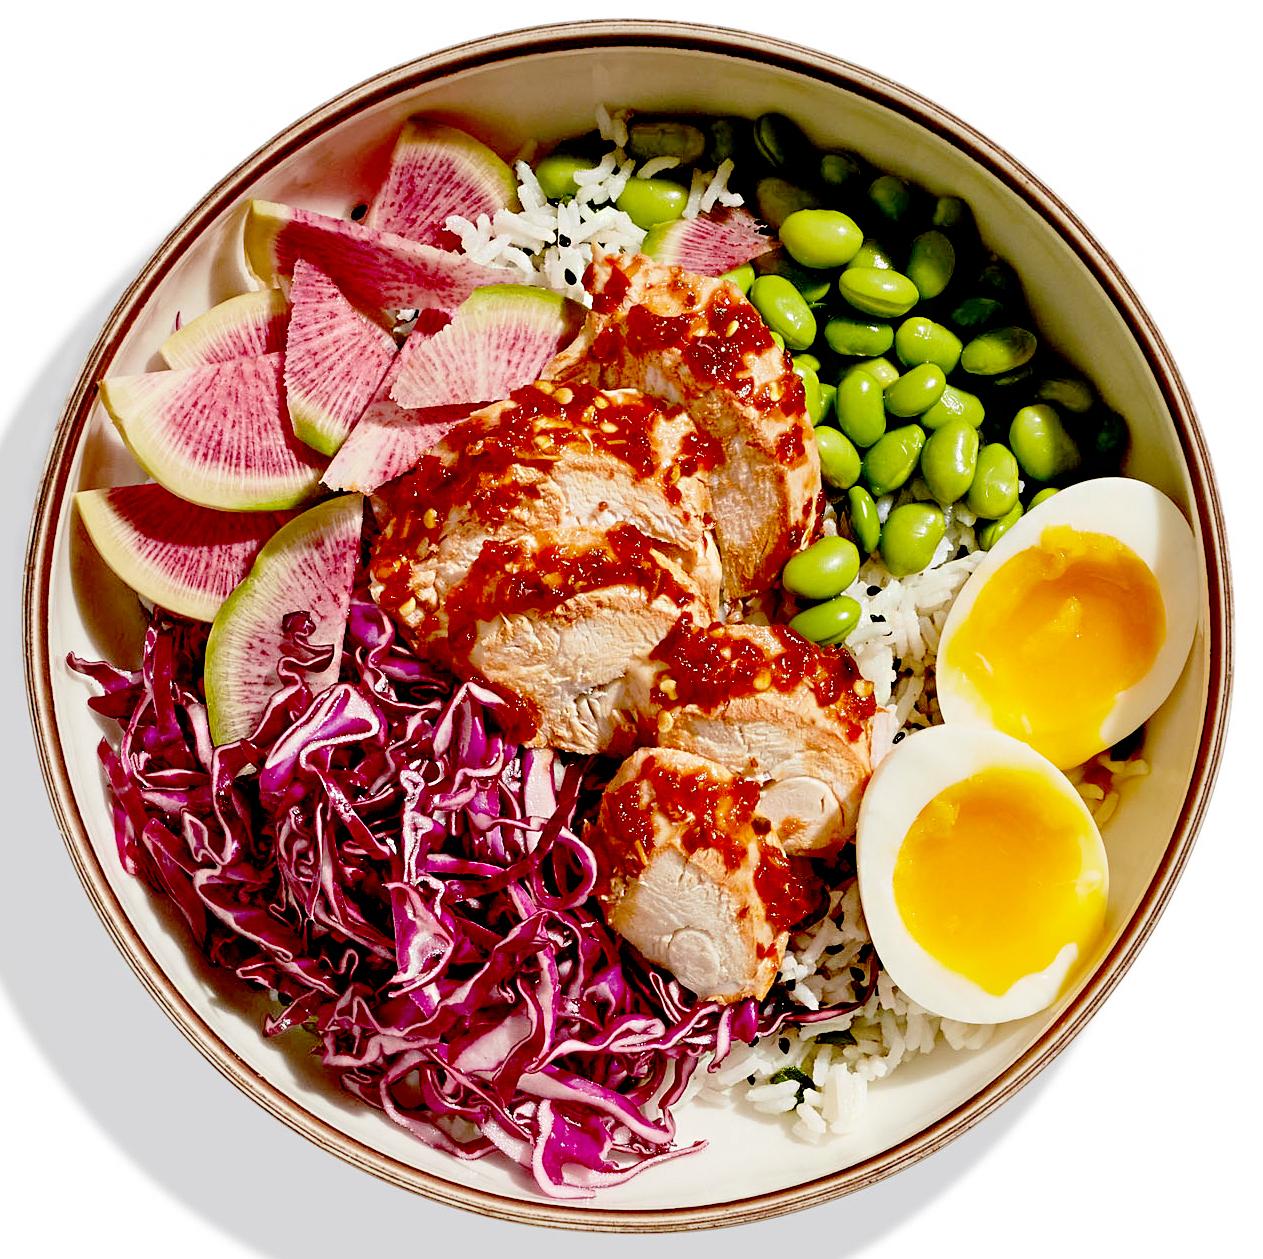 chile-glazed-rotisserie-chicken-rice-bowl-b13d3cd6